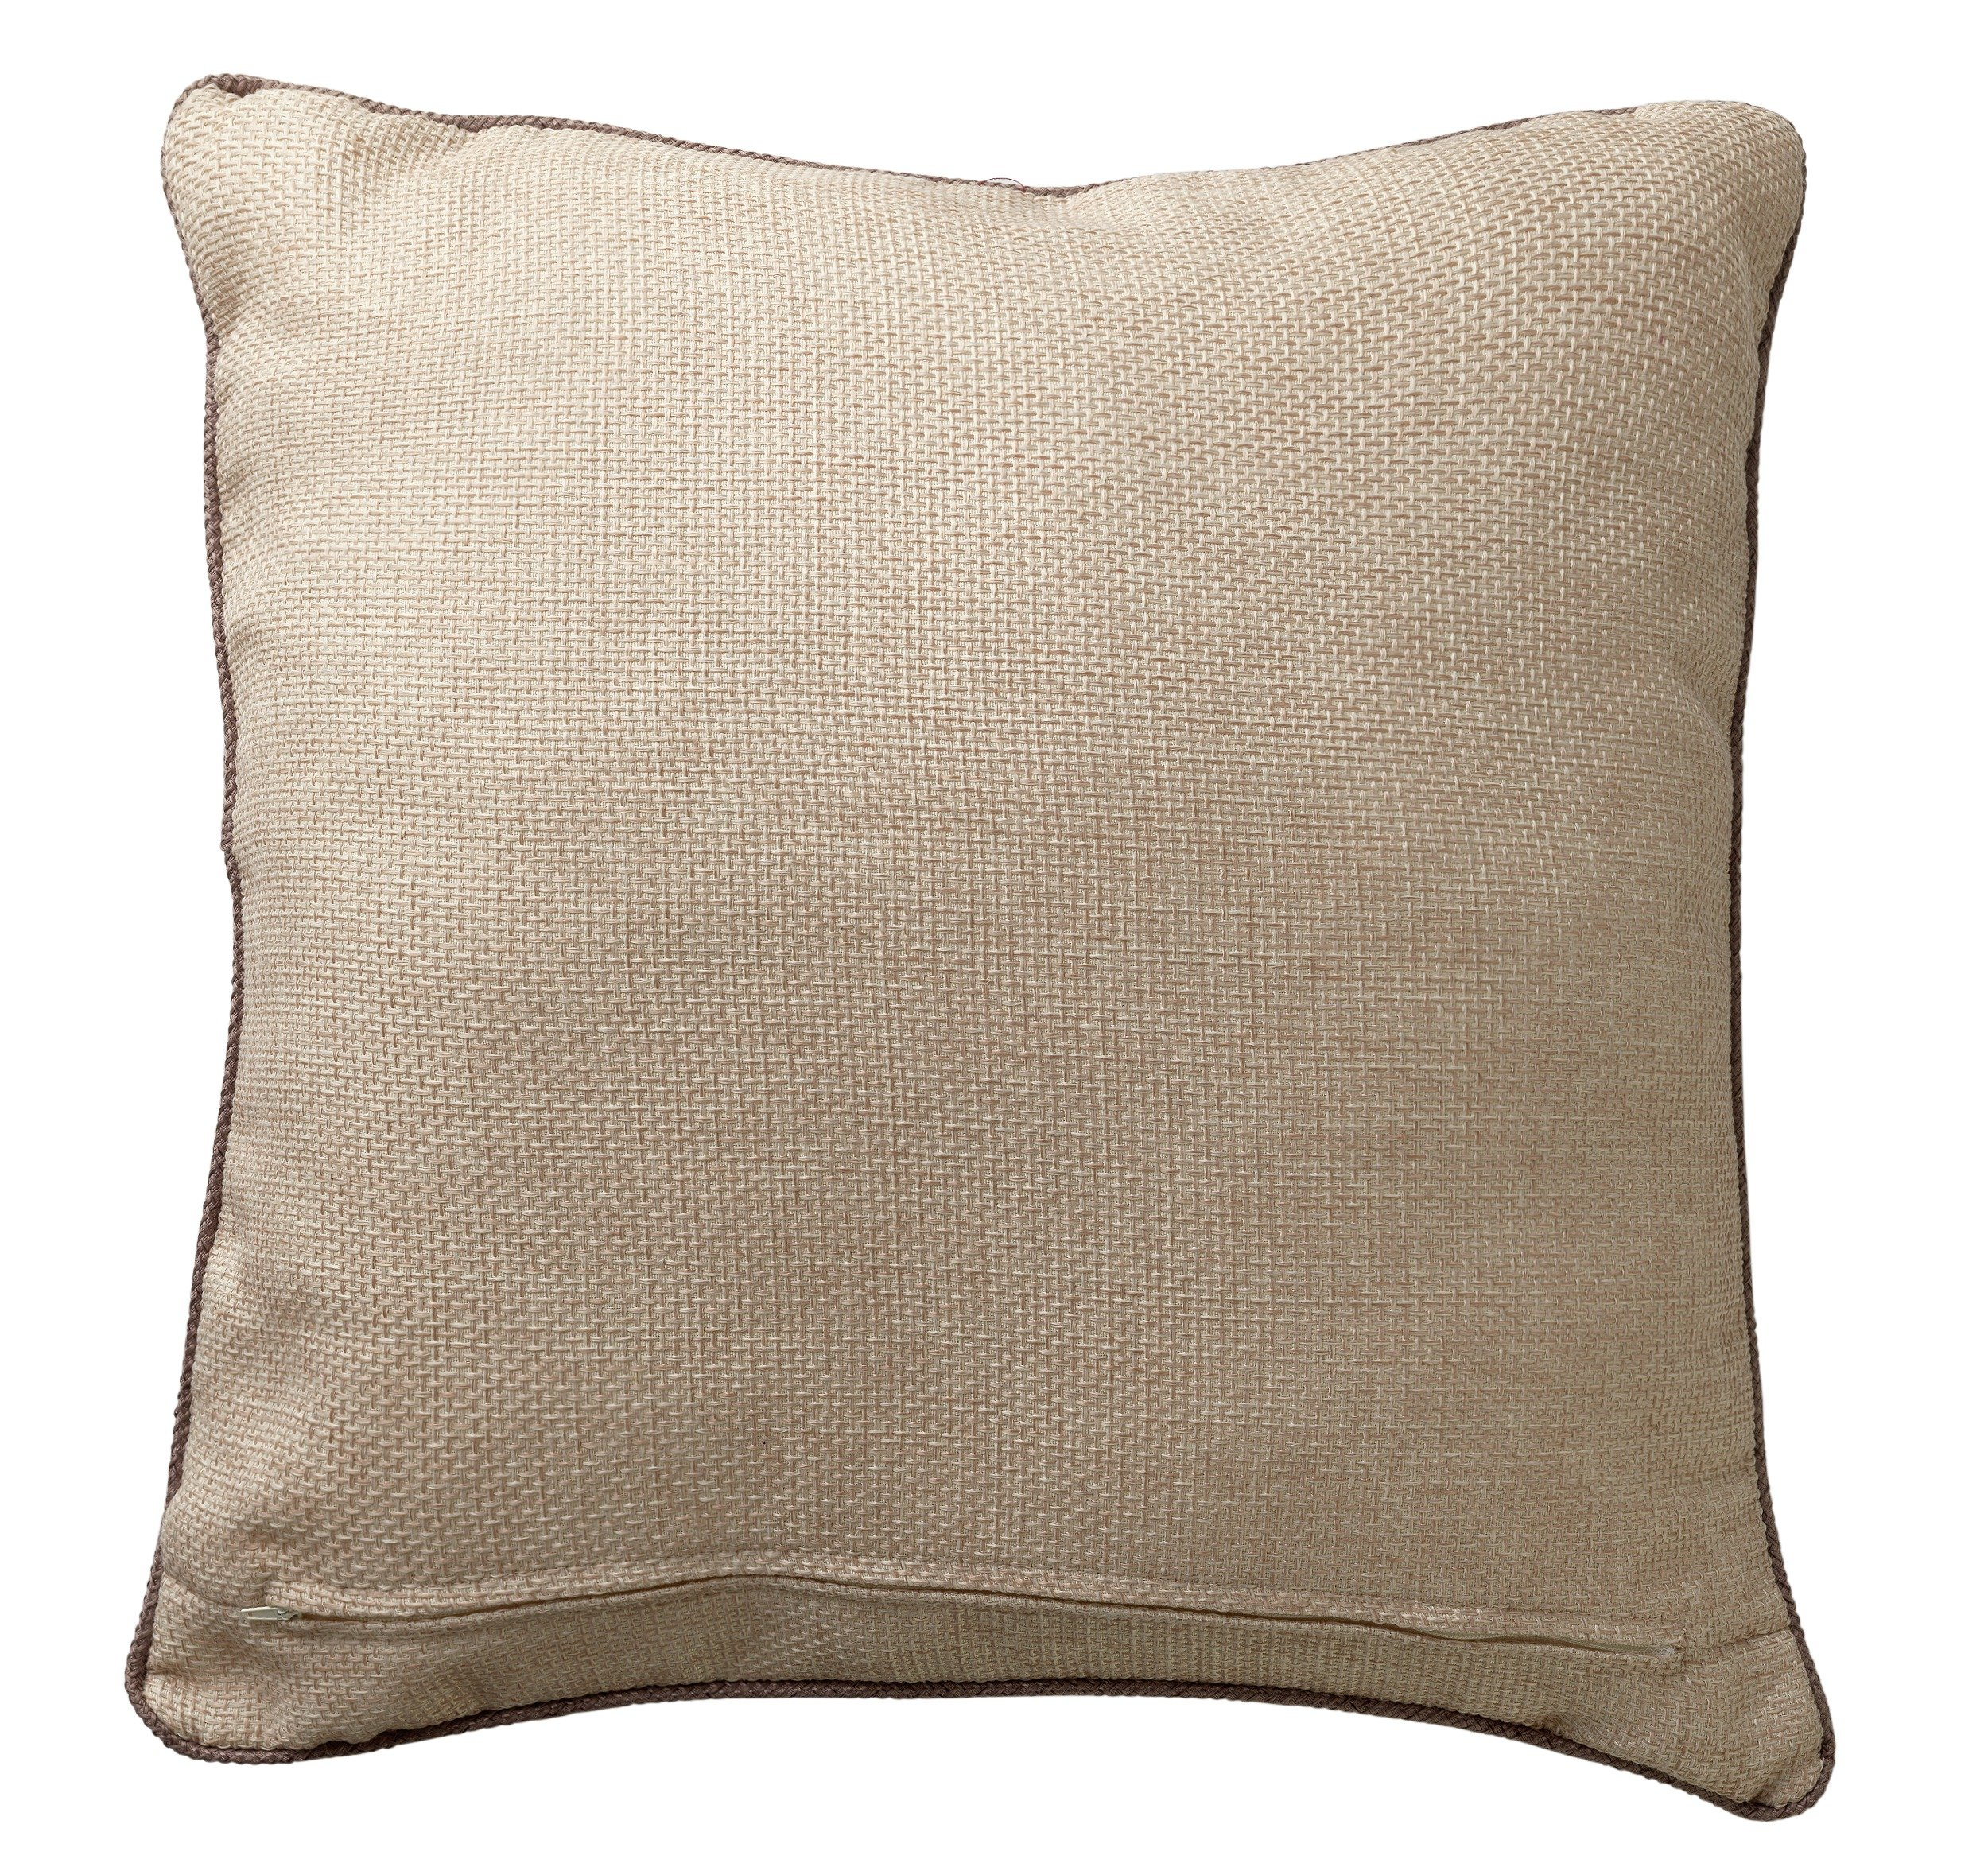 Heart of house hudson large cushion oatmeal for Chair cushion covers argos